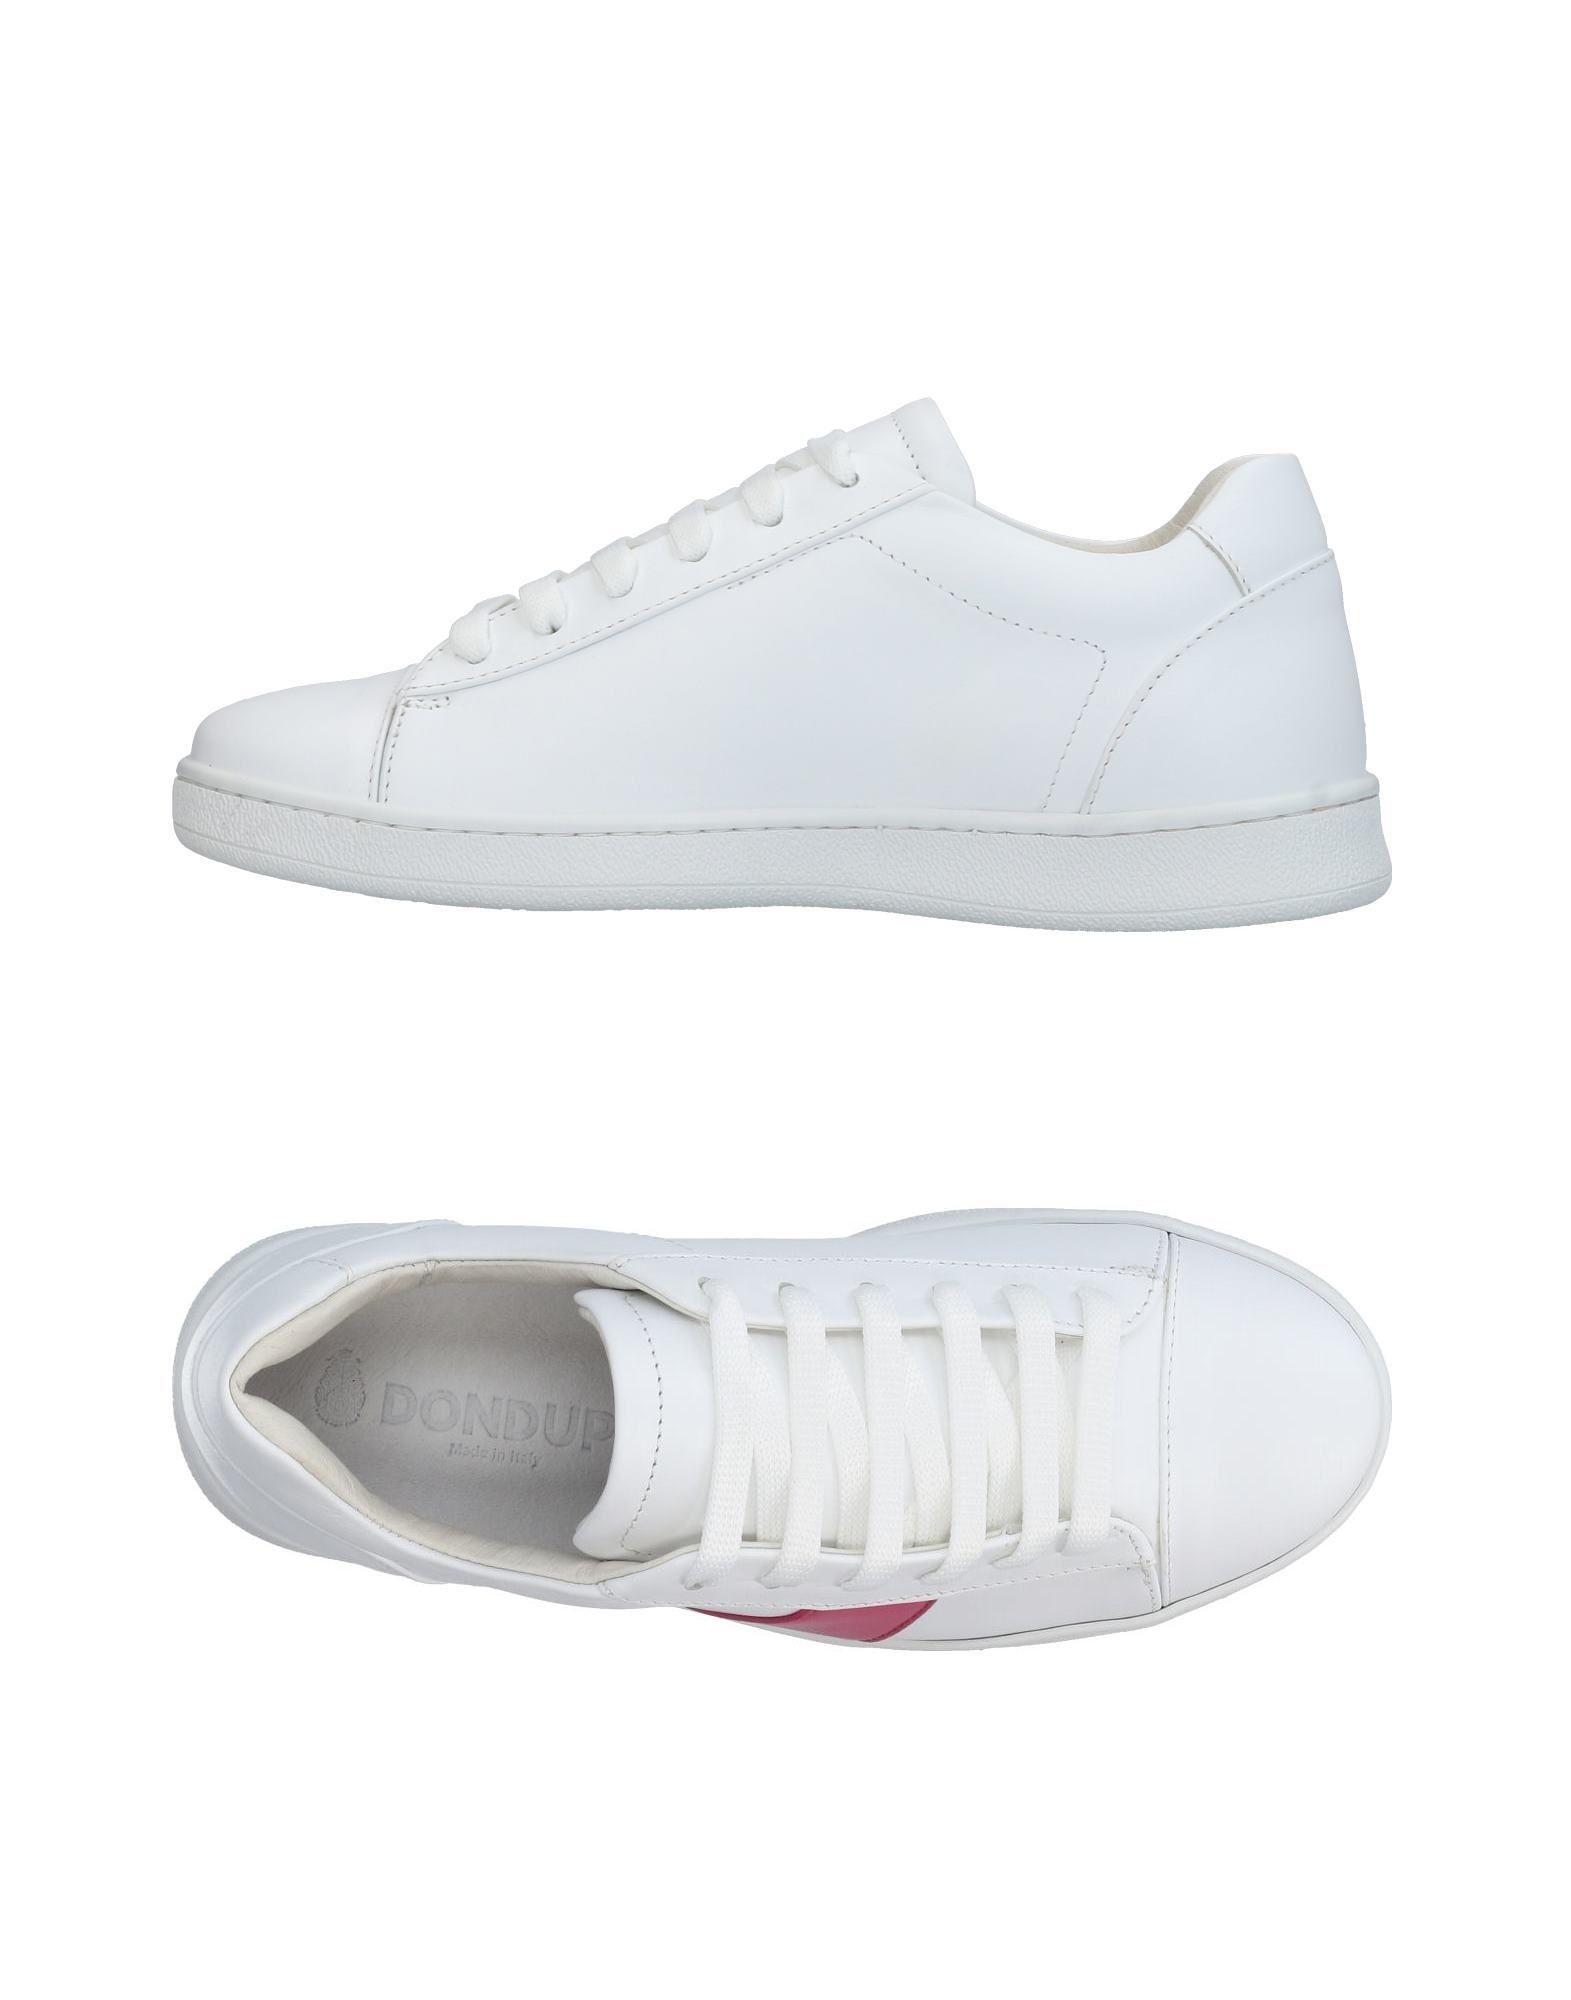 Sneakers Dondup Donna - Acquista online su